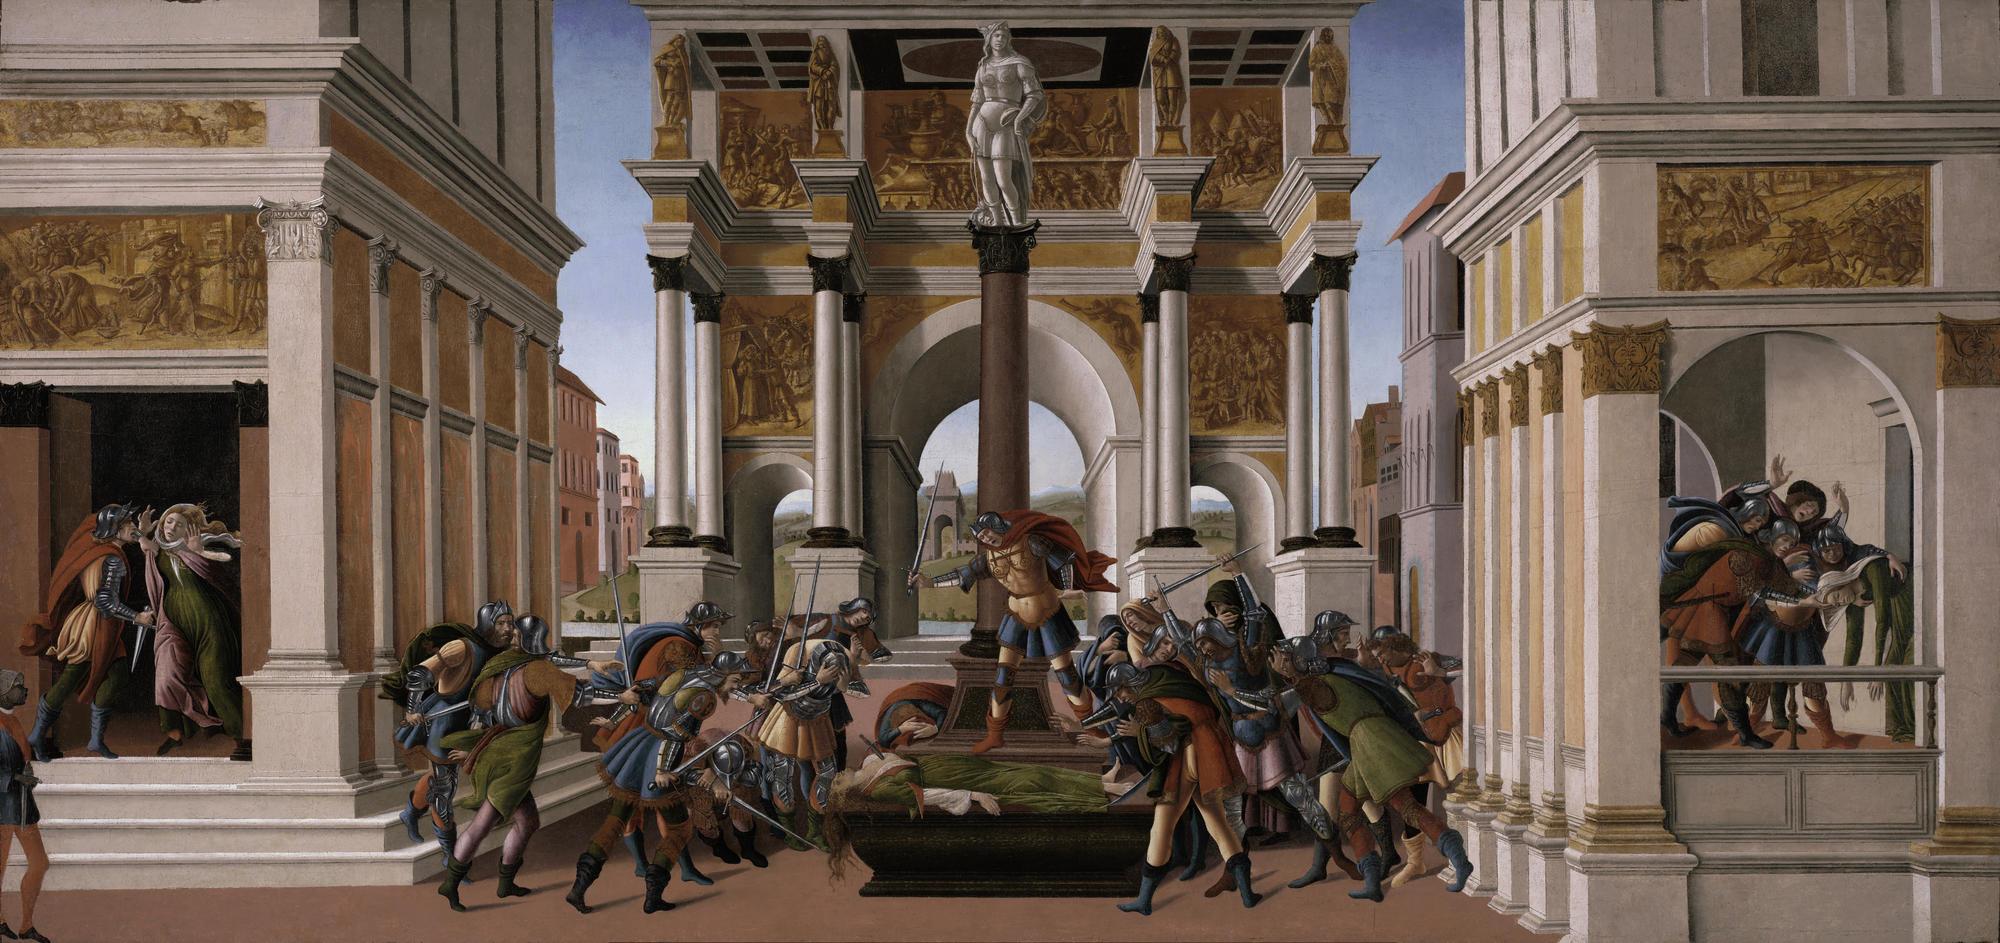 Sandro Botticelli (Italian, 1444 or 1445-1510), The Tragedy of Lucretia, 1499-1500. Tempera and oil on panel, 83.8 x 176.8 cm (33 x 69 5/8 in.) Isabella Stewart Gardner Museum, Boston